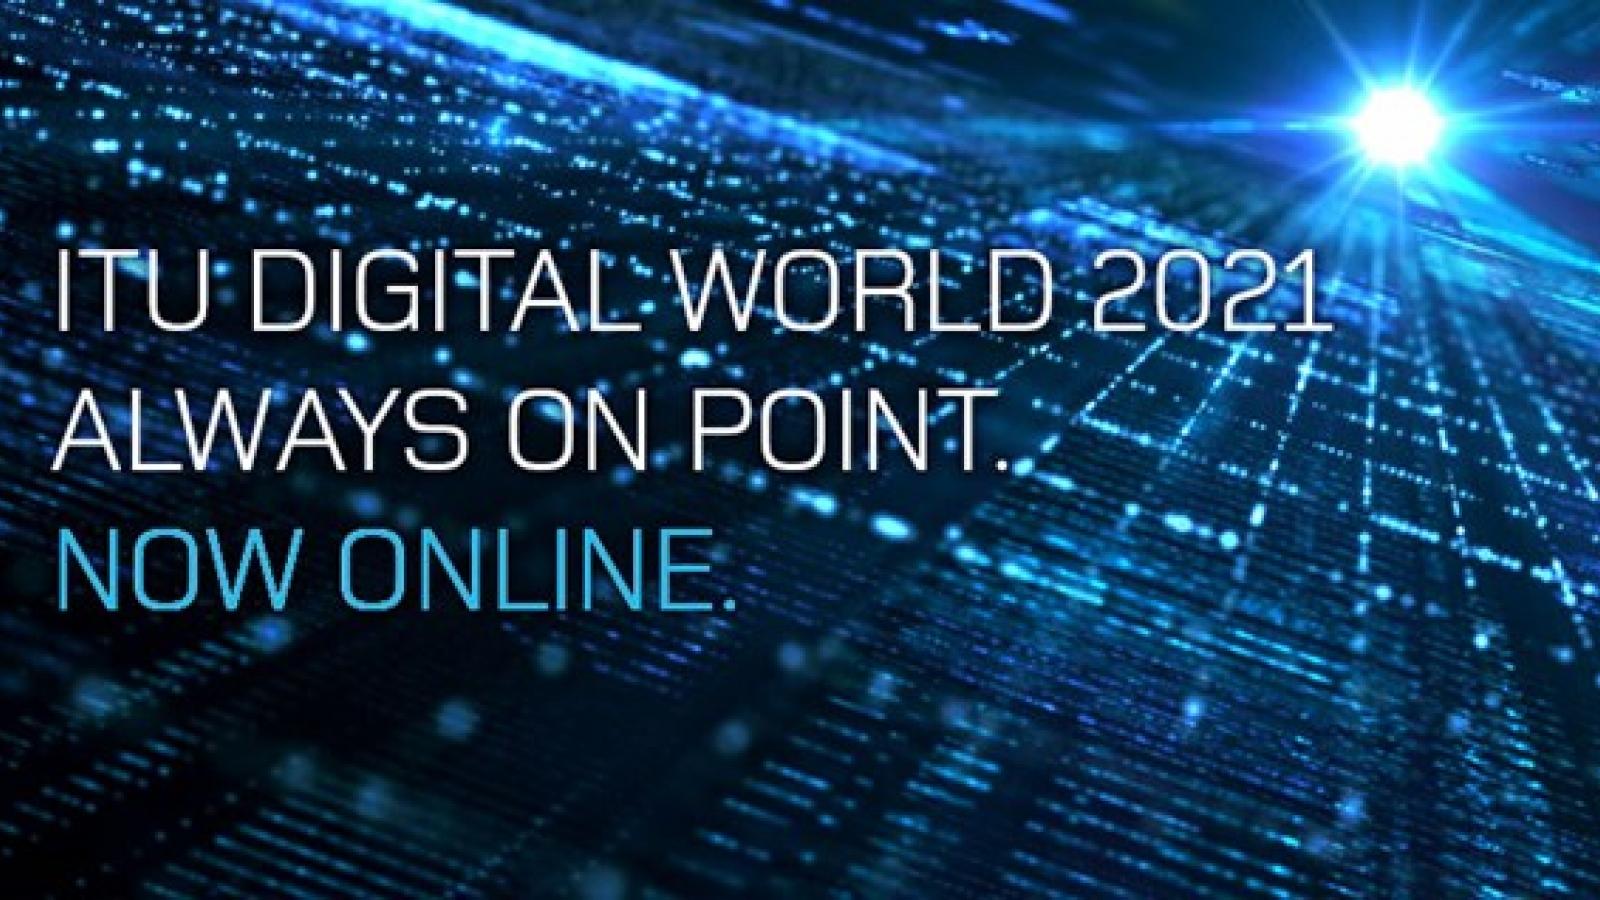 ITU Digital World 2021 kicks off in Vietnam on Oct. 12